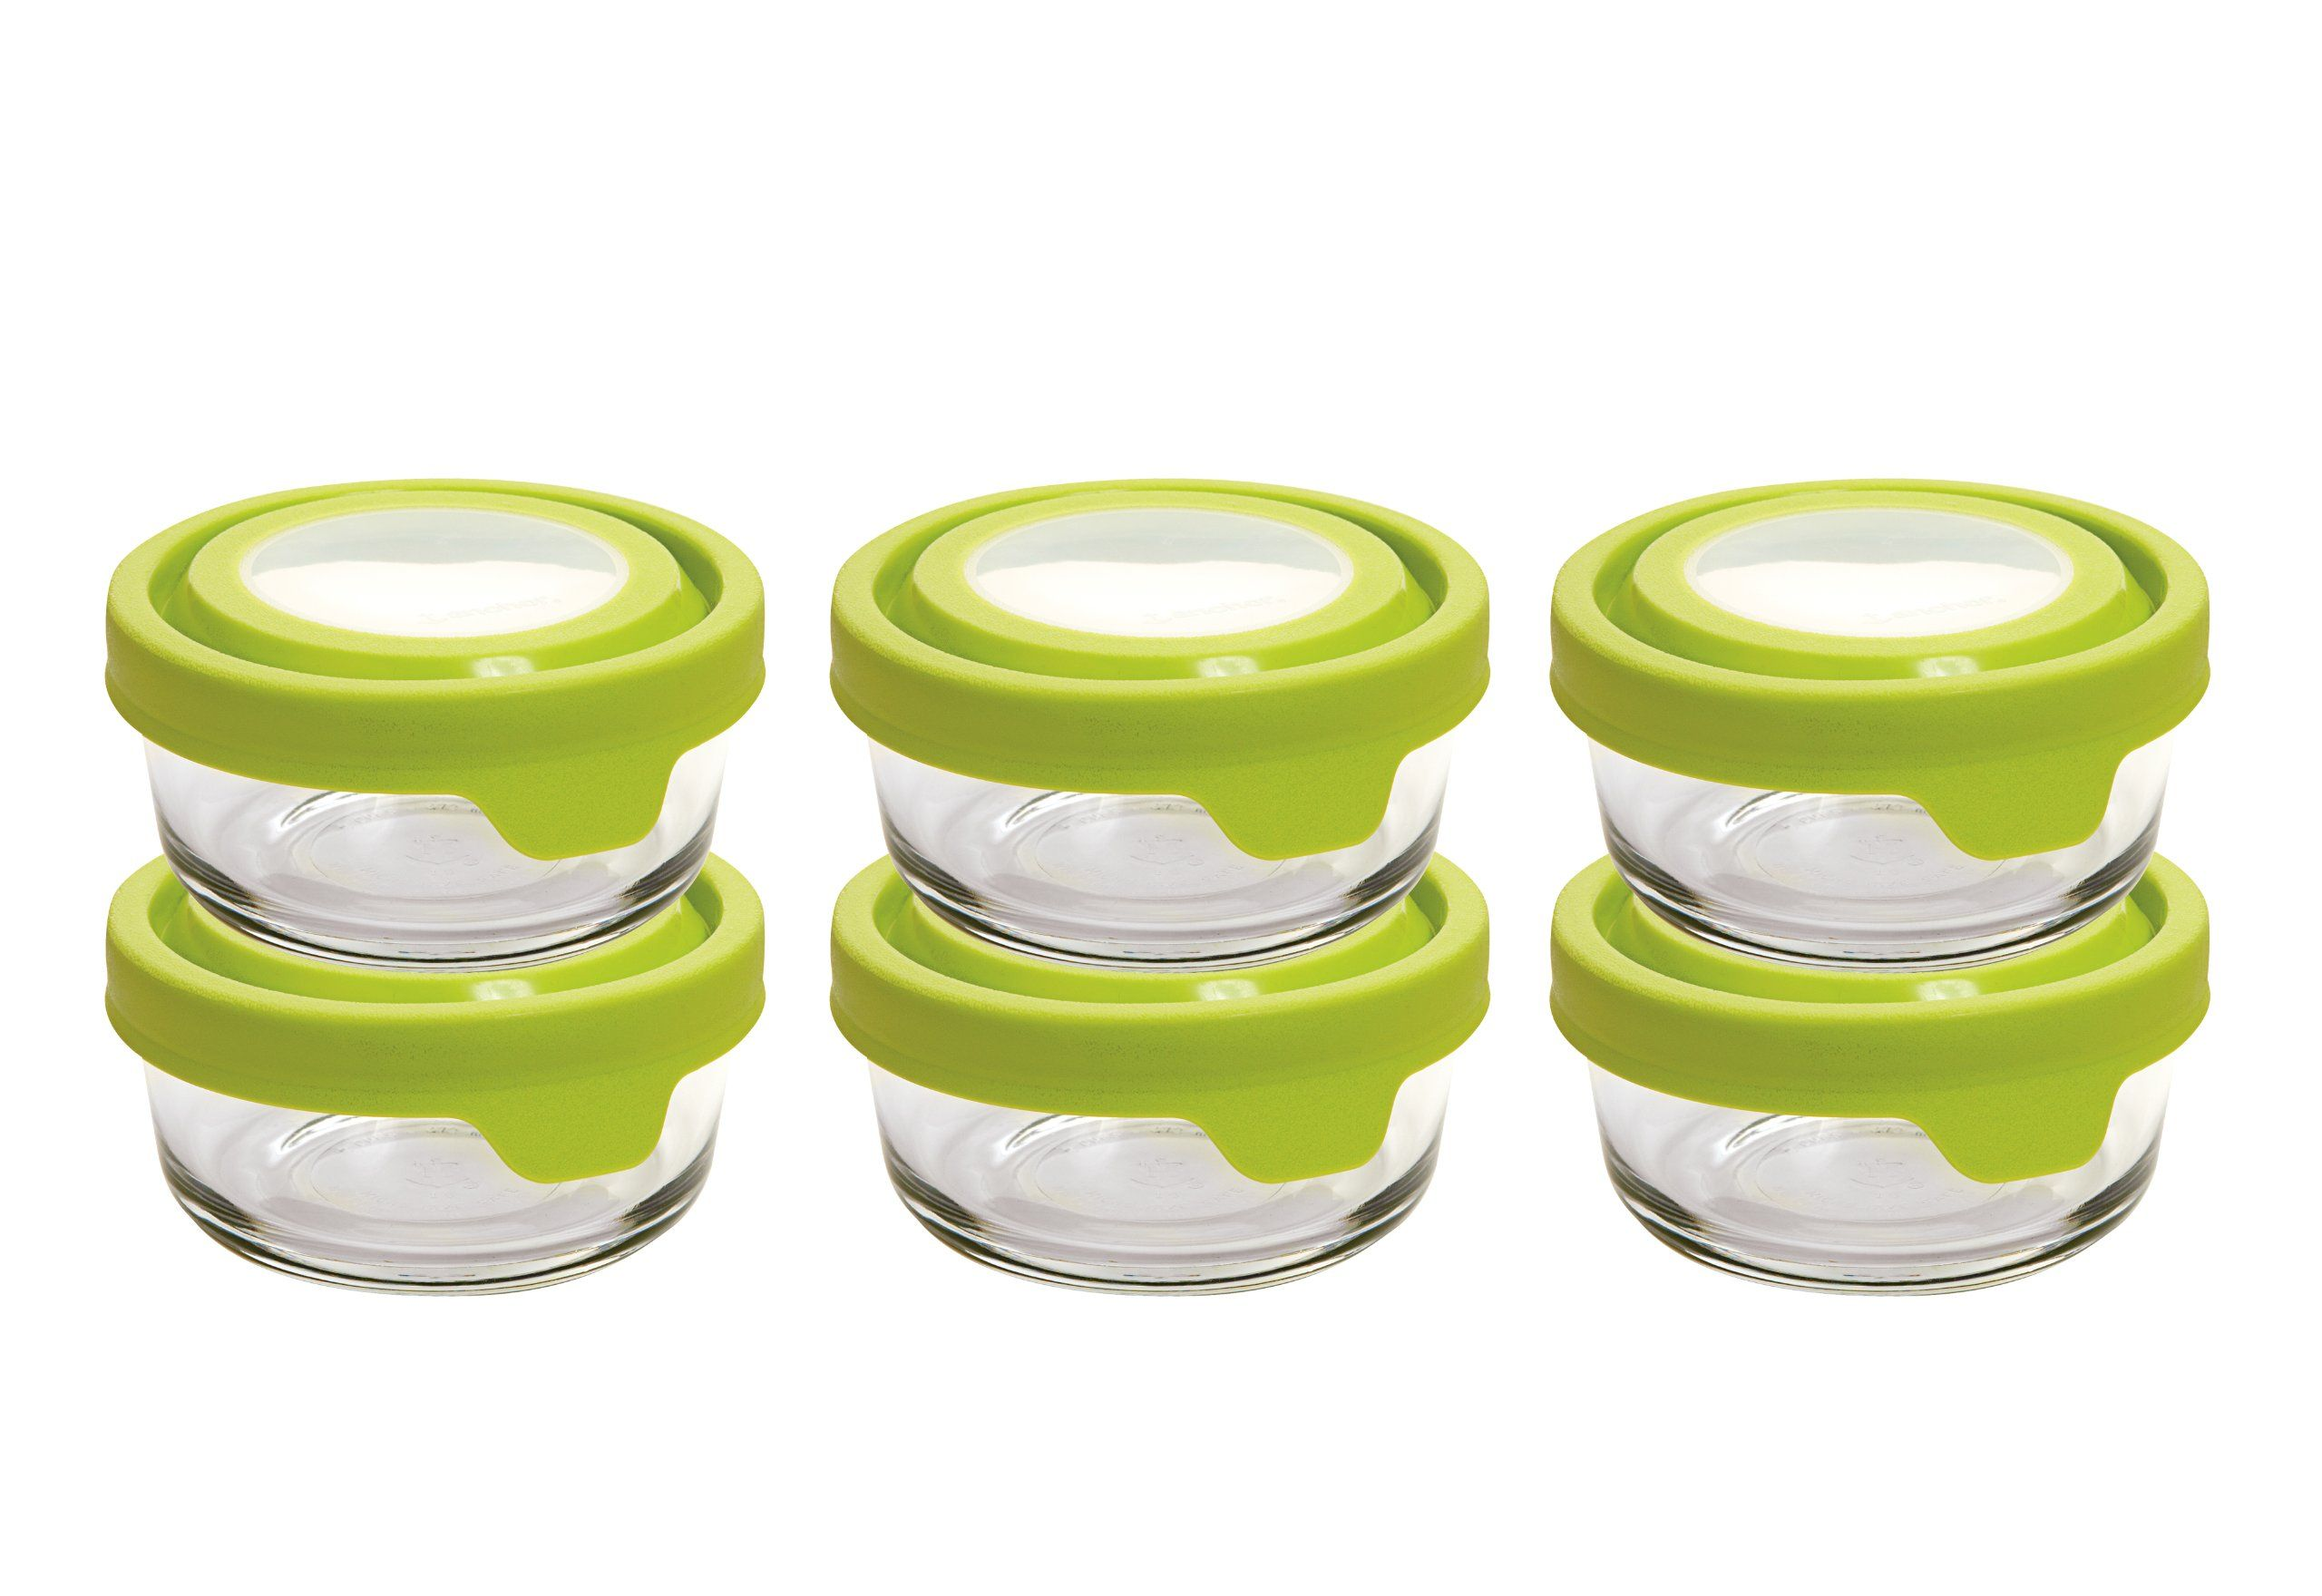 ad23f4ad03bf Amazon.com: Anchor Hocking TrueSeal Glass Round 1 Cup Food Storage ...